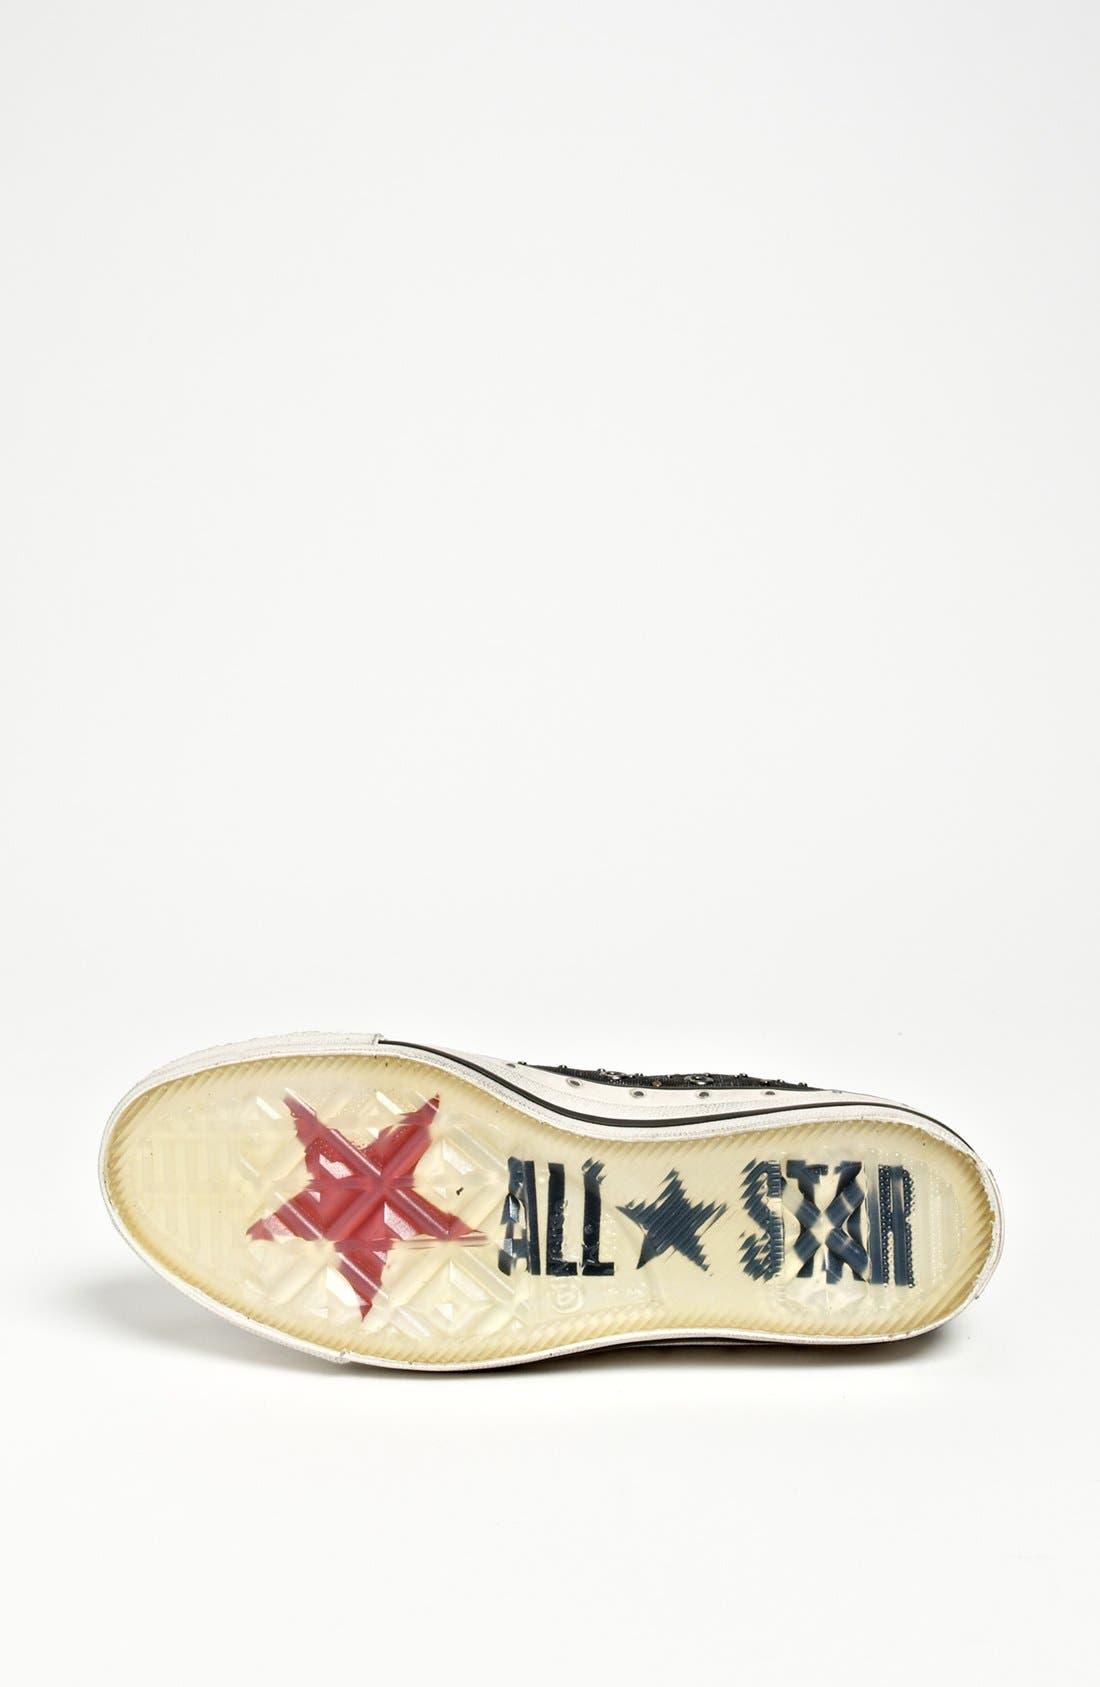 Alternate Image 4  - Converse by John Varvatos 'All Star® Hi Studded' Sneaker (Women)